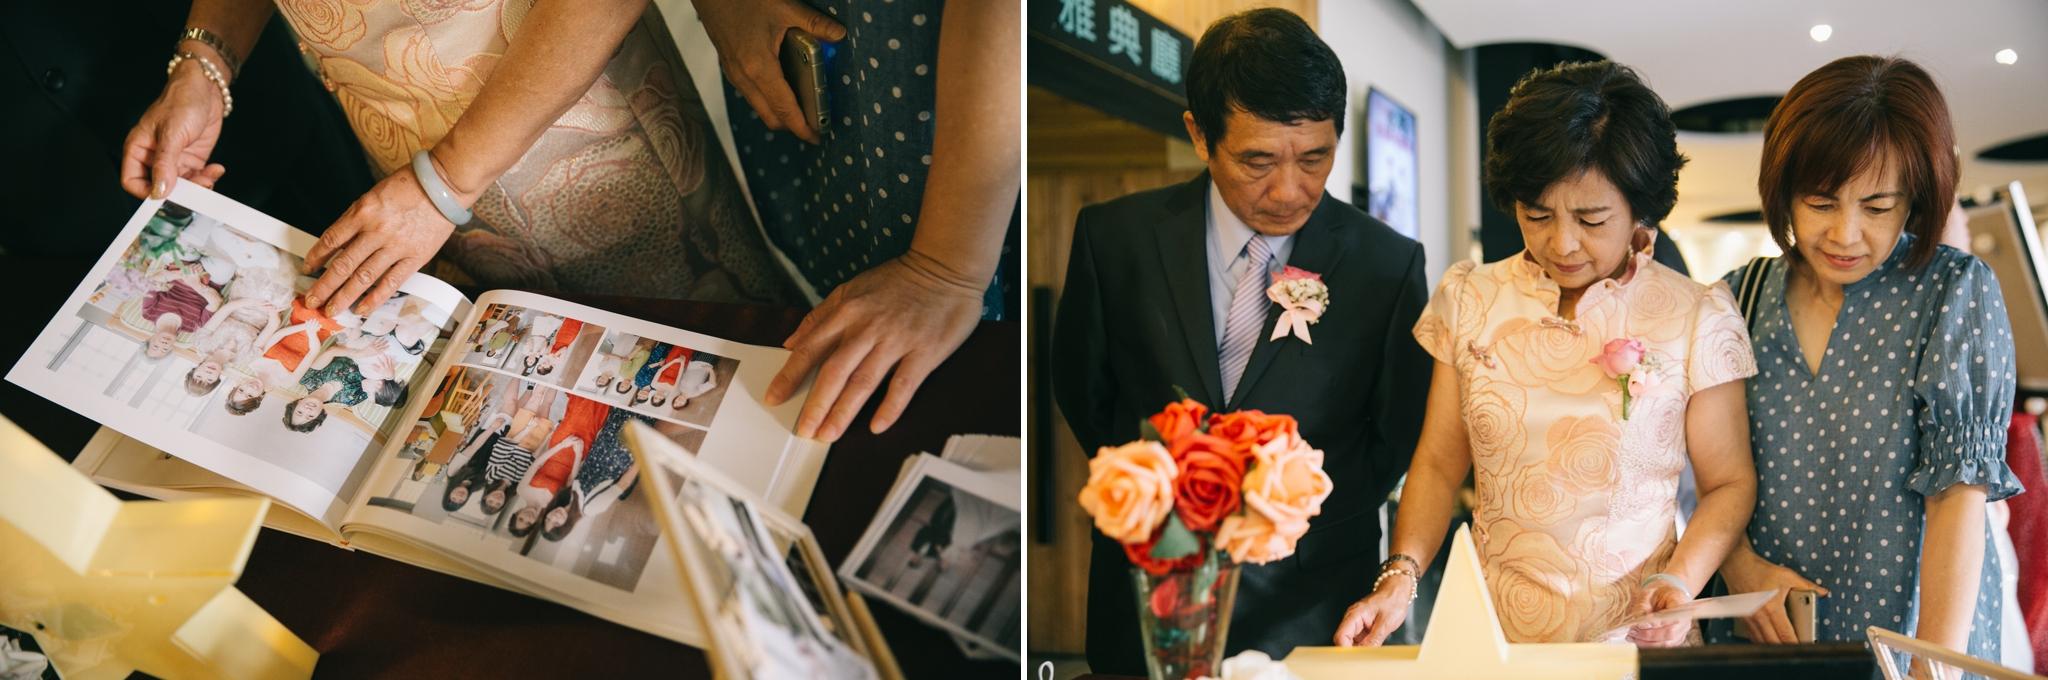 Tina+Nash-wedding-台北婚禮迎娶晚宴-新莊終身大事-106.jpg